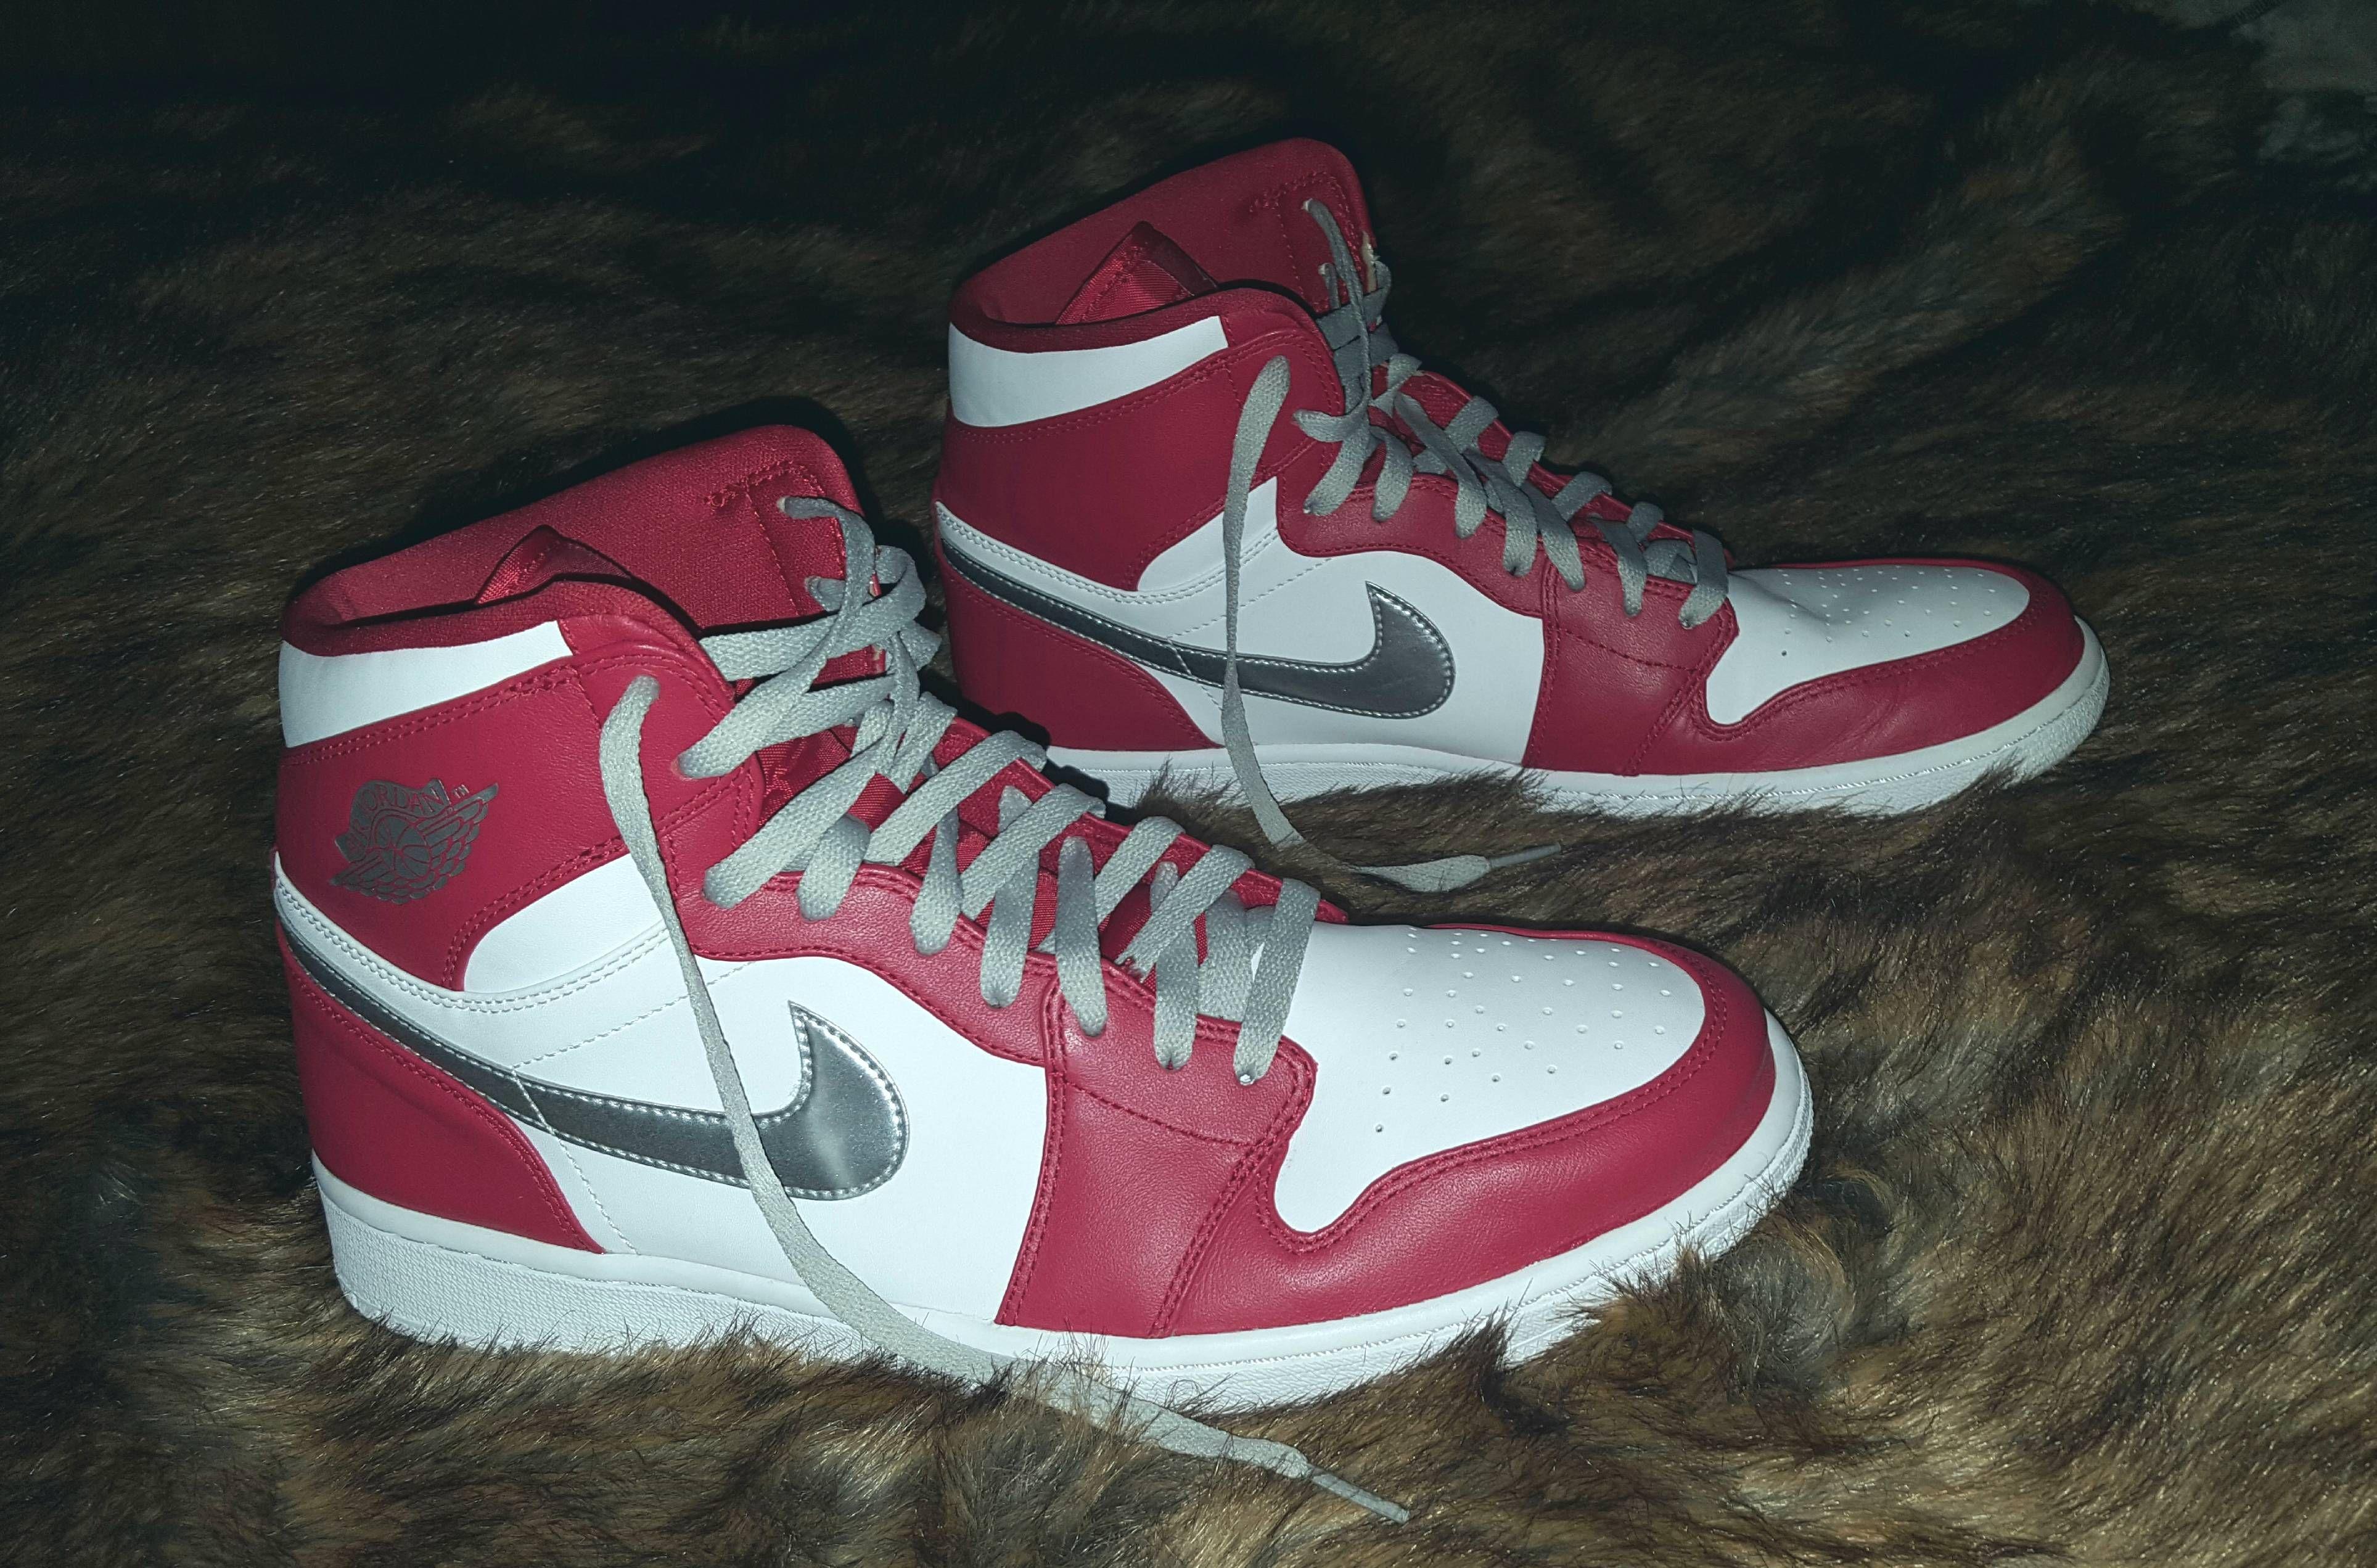 Silver 1 Jordan Medal SwapNike Lace Sneakers dxCBoe